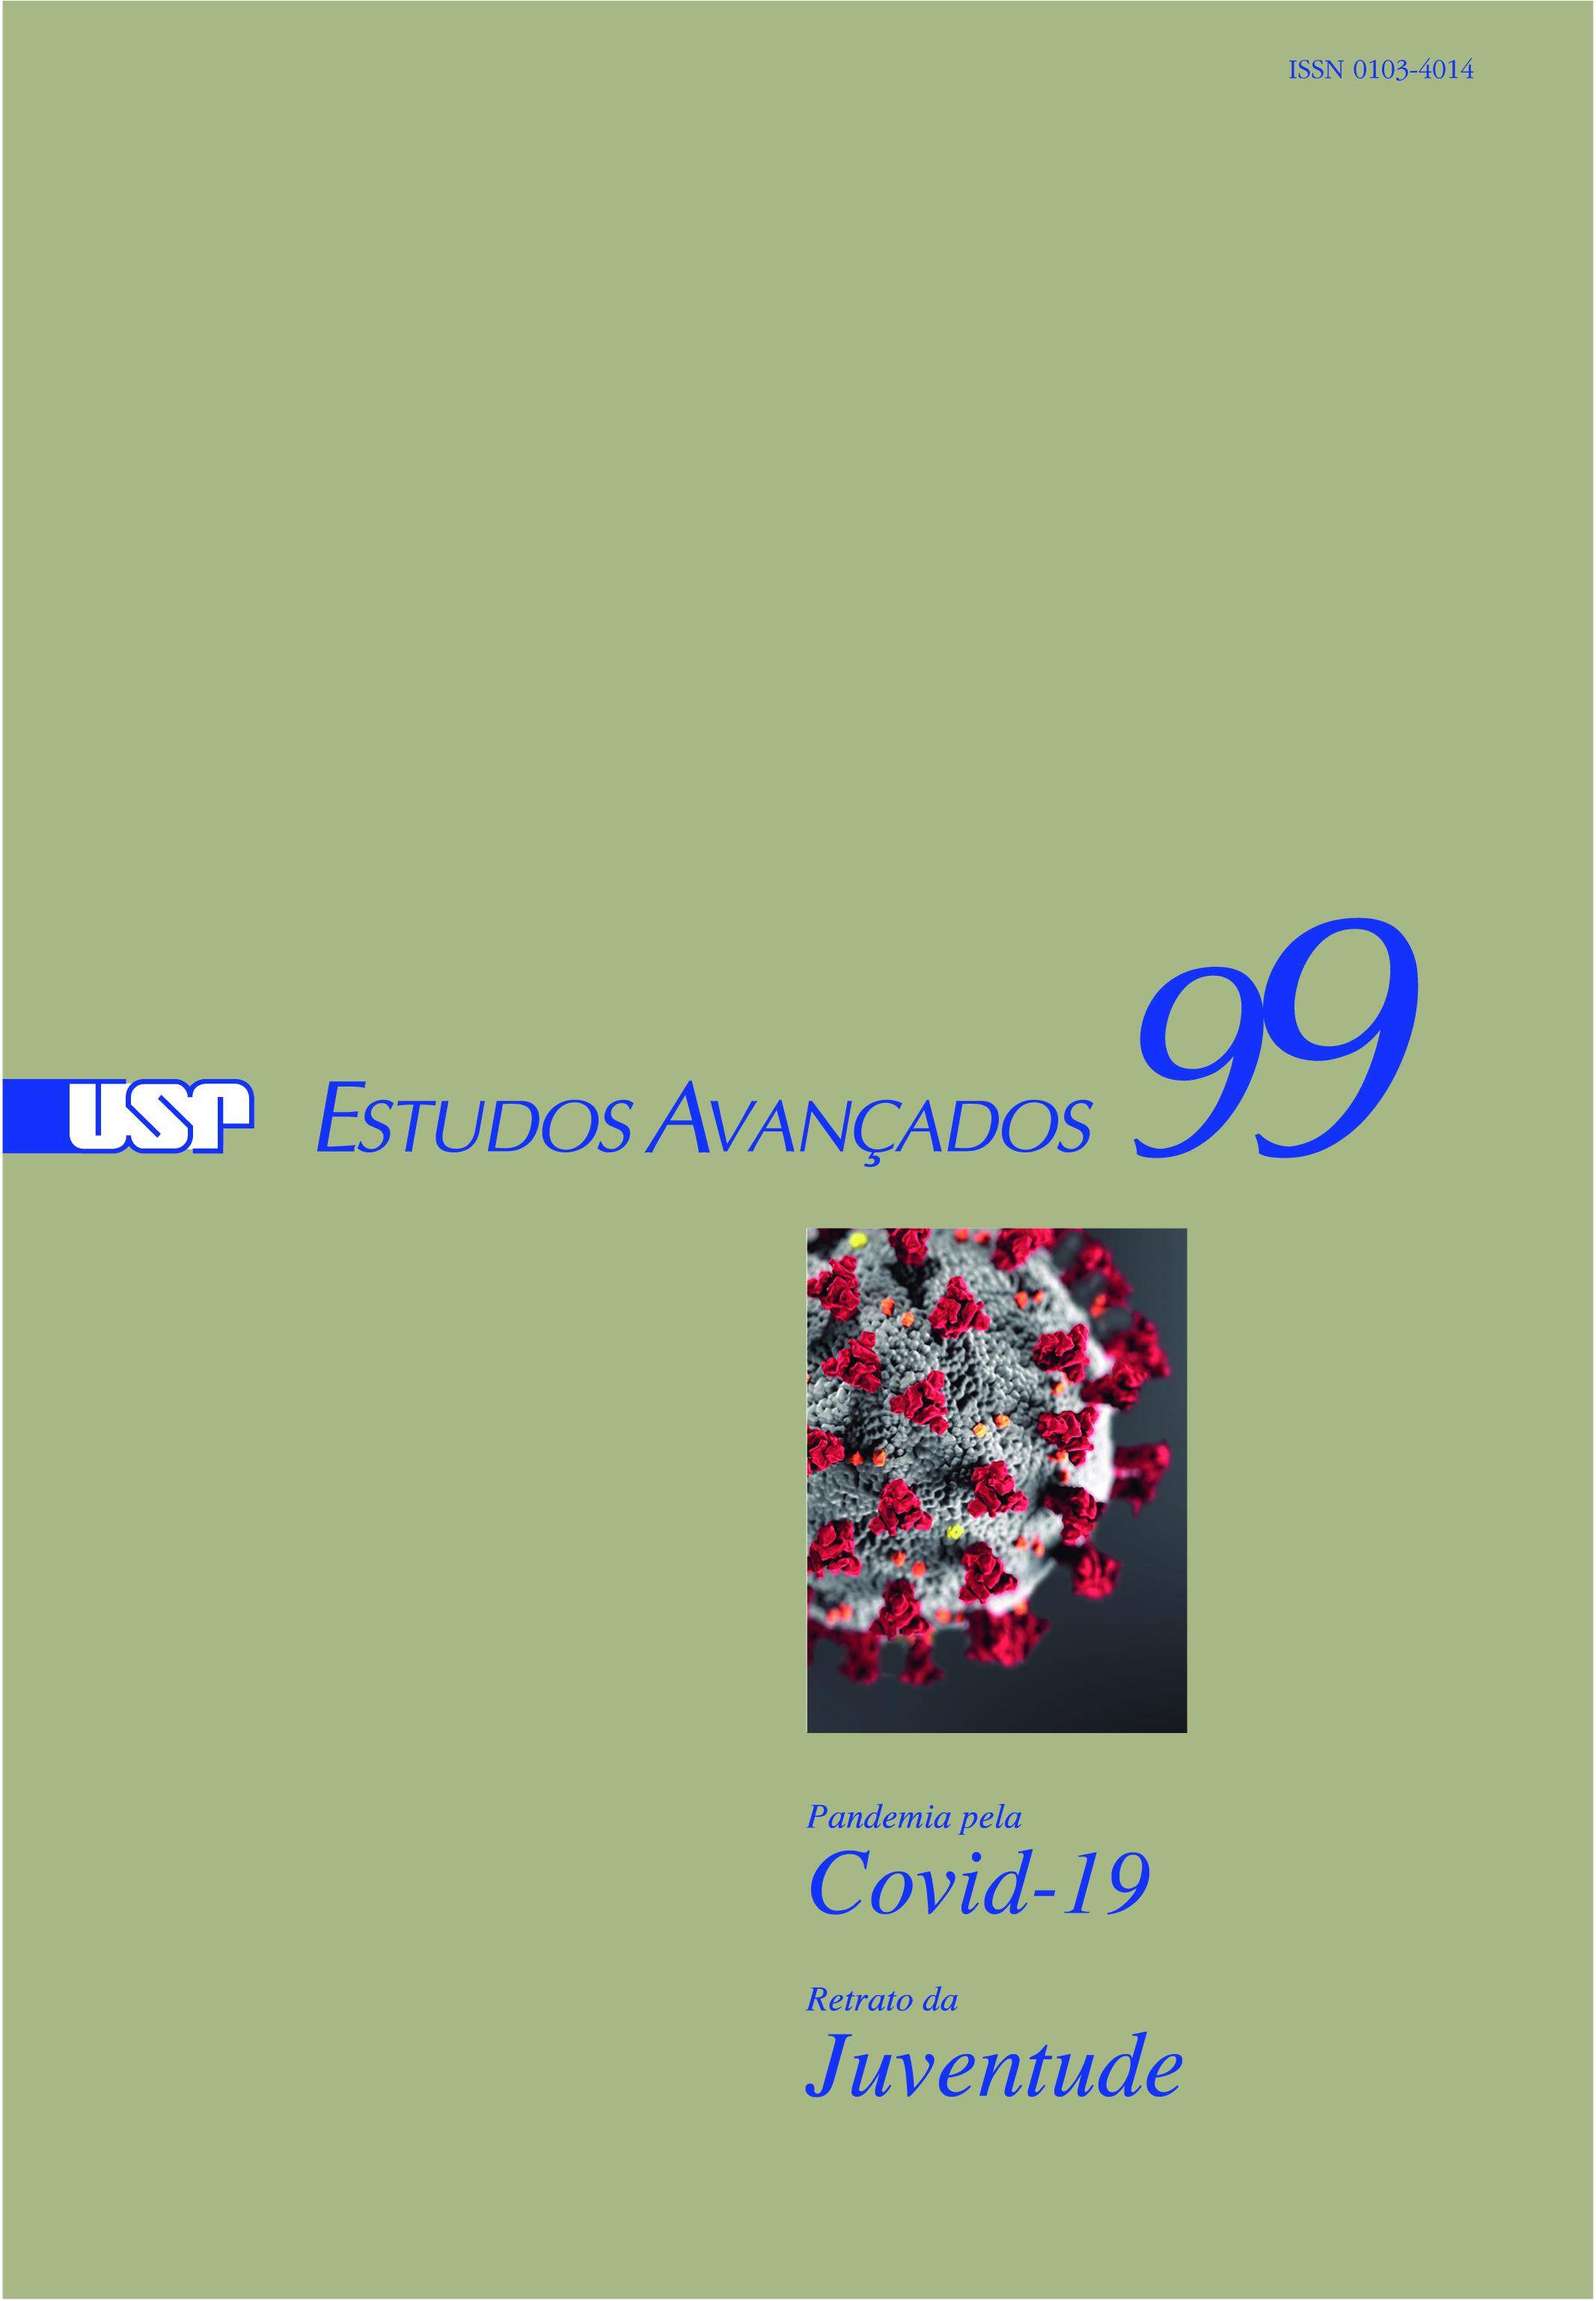 Visualizar v. 34 n. 99 (2020)